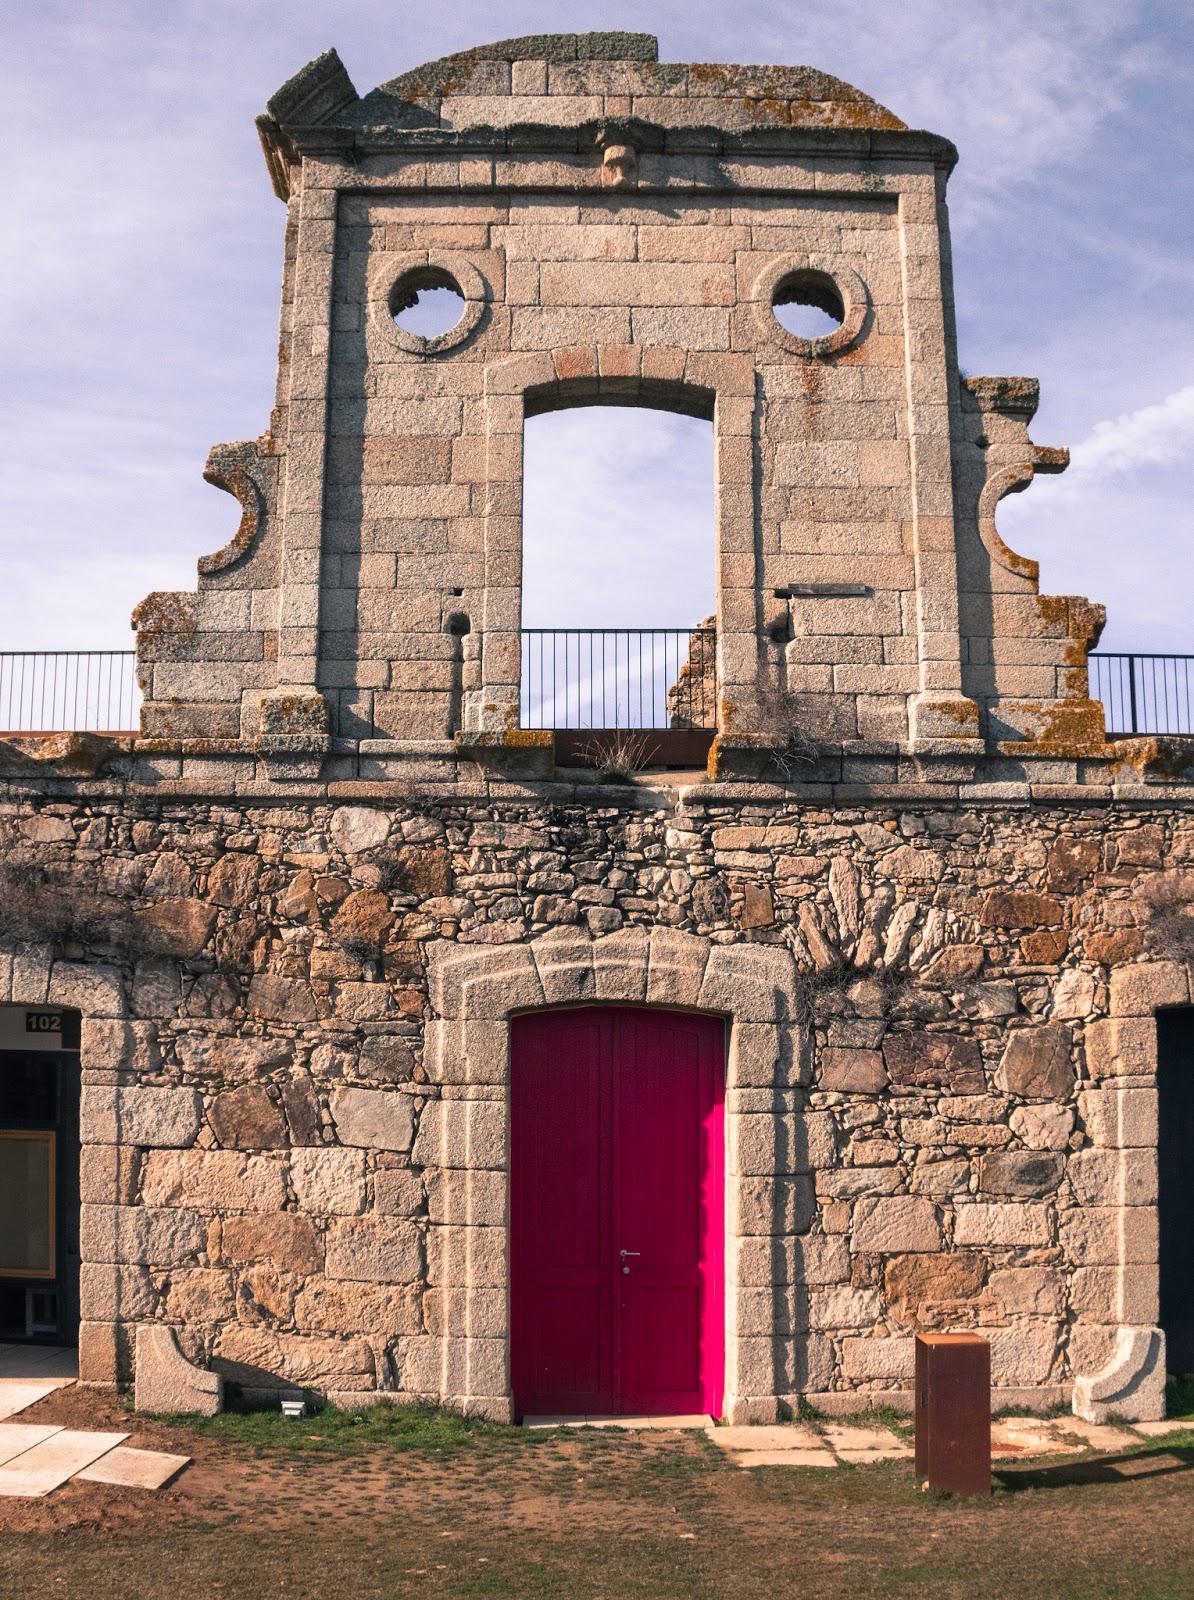 Hotel Real Fuerte, Aldea del Obispo, Salamanca 2015